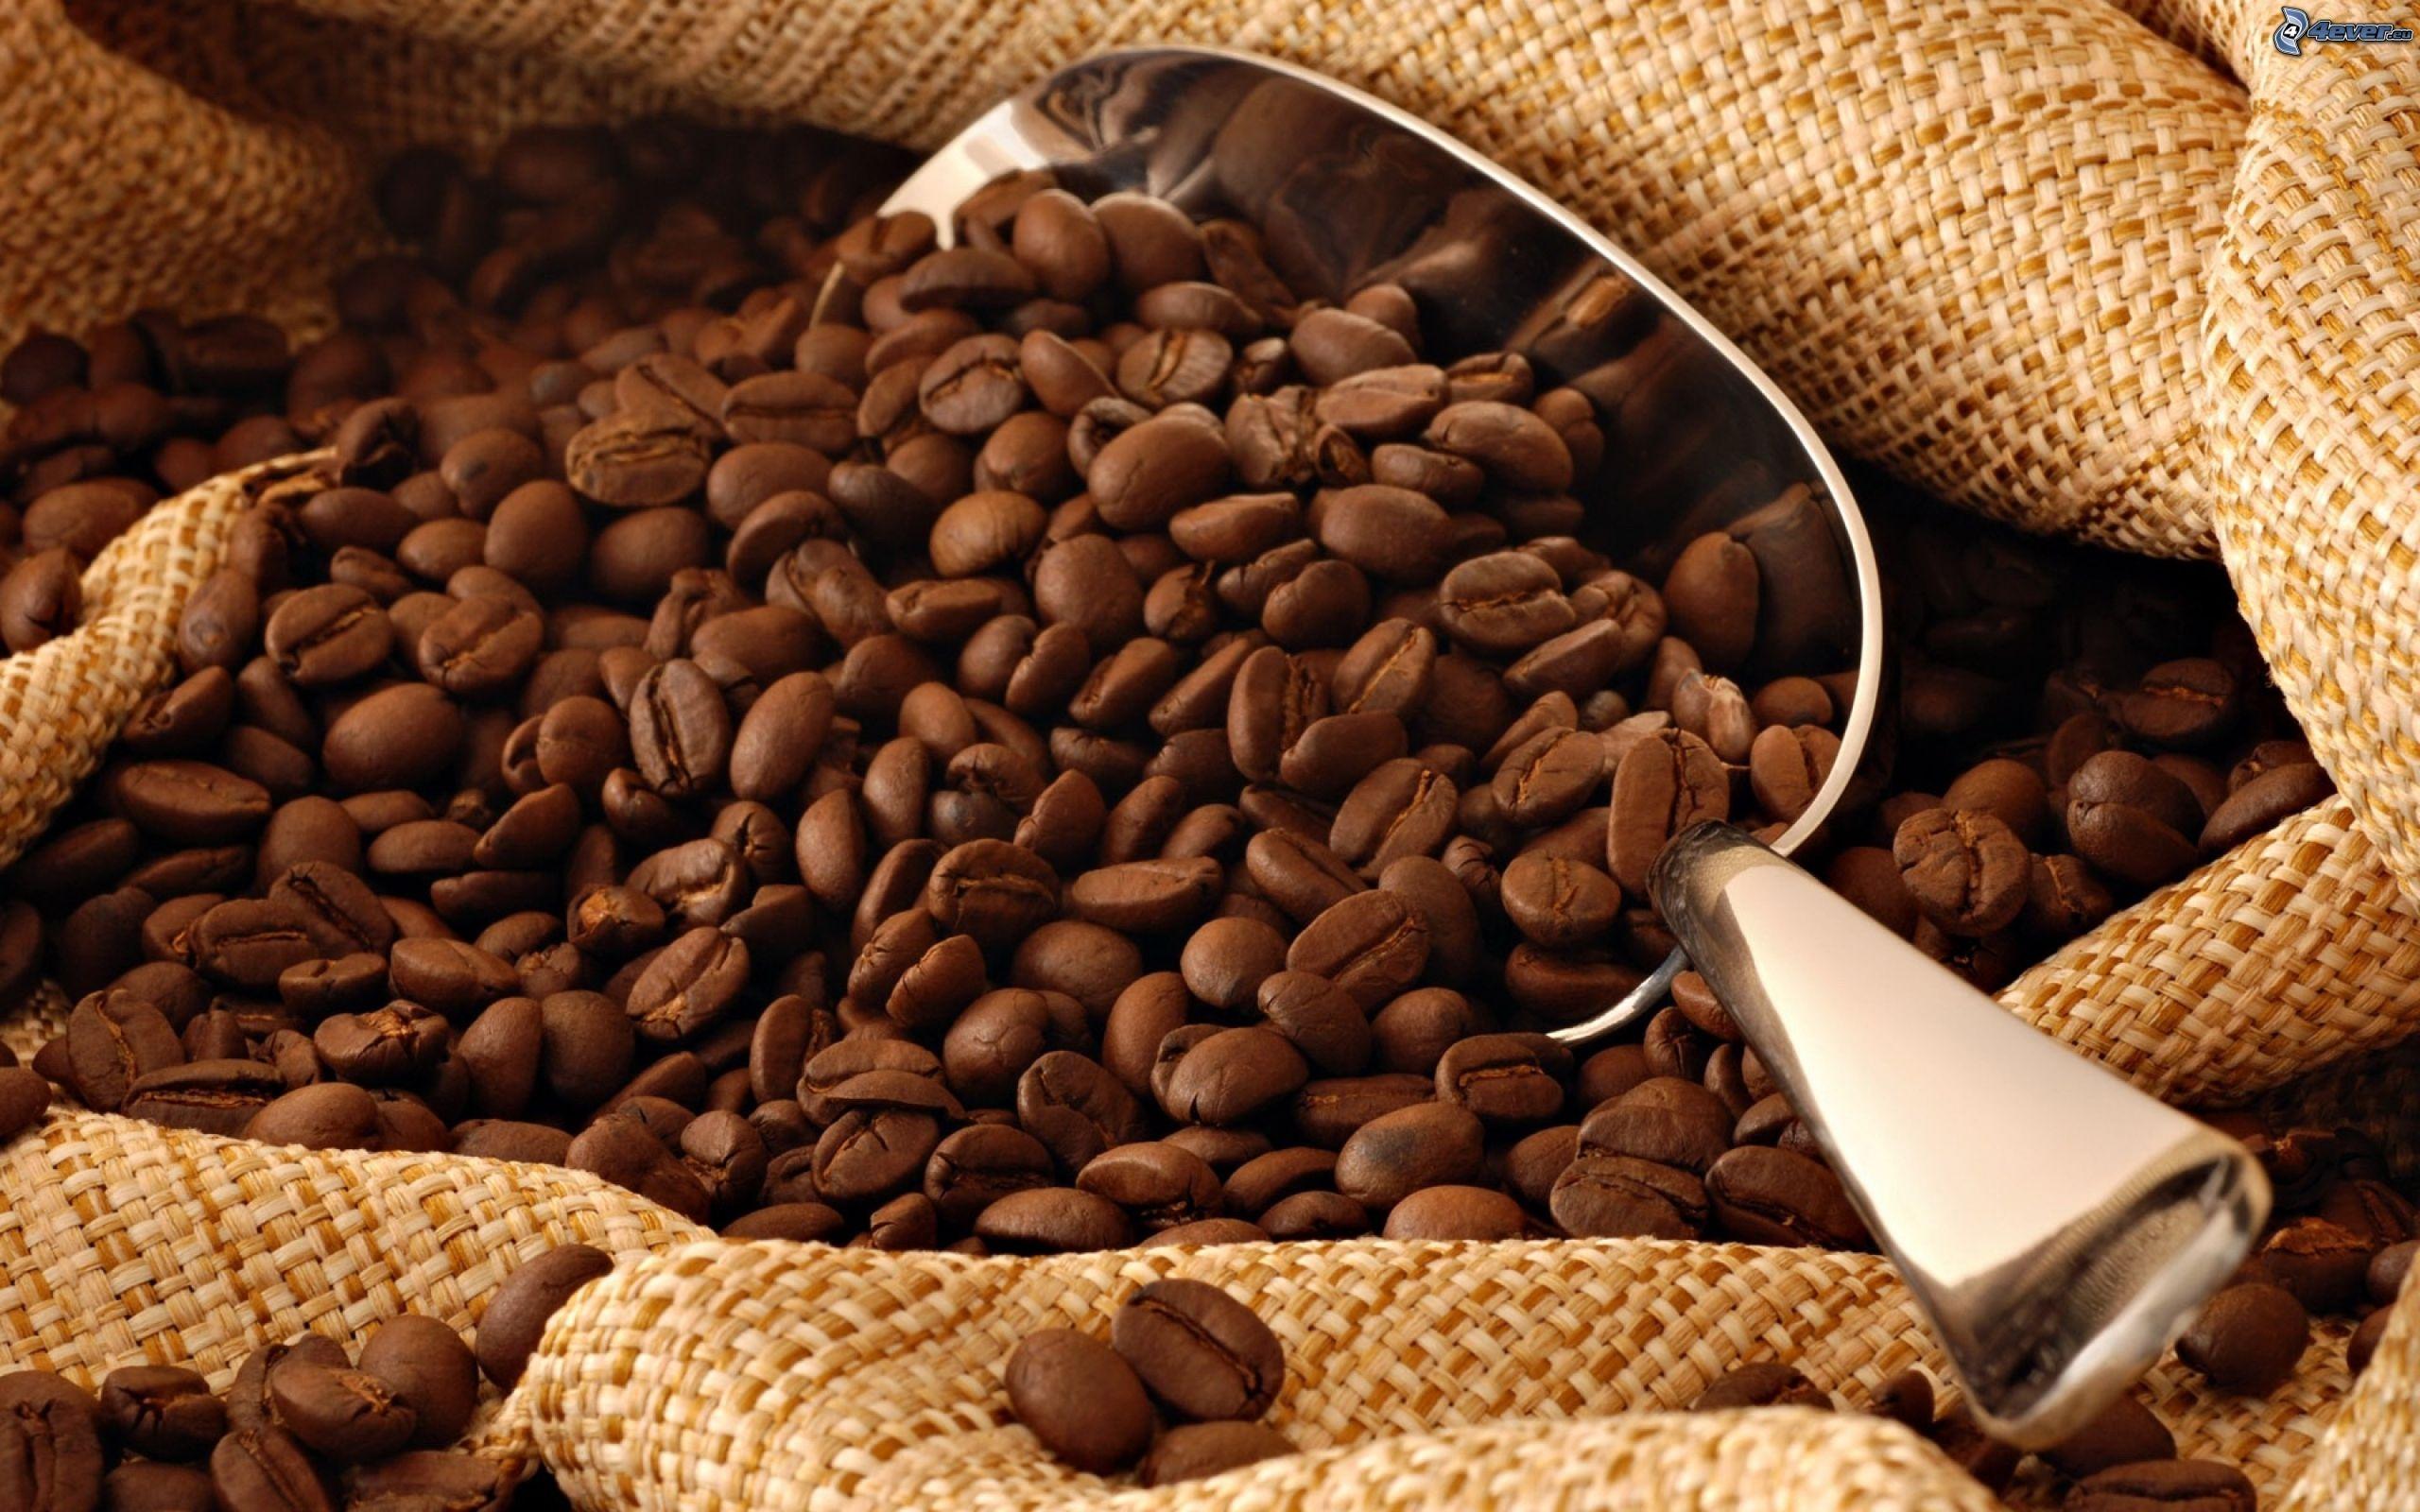 Kaffeebohnenjpg